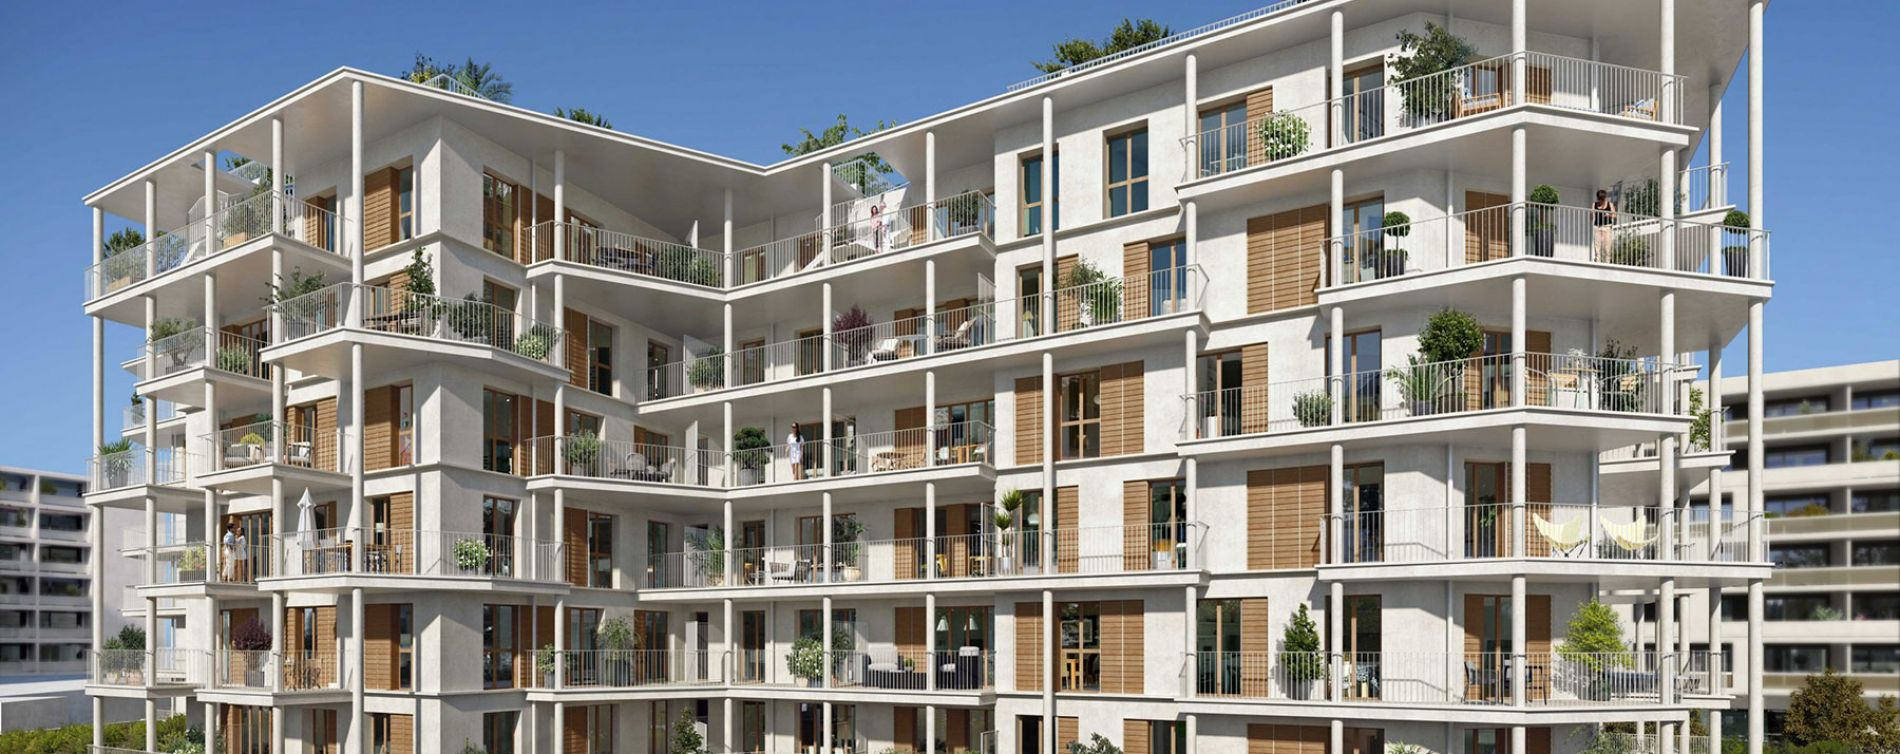 Annemasse : programme immobilier neuve « Onirik » en Loi Pinel